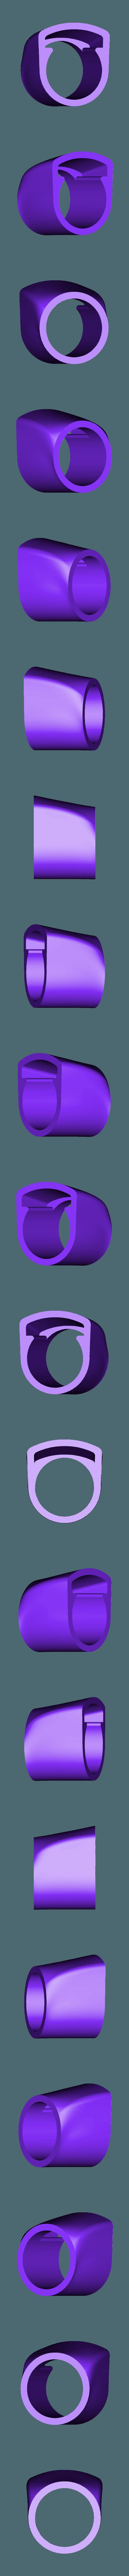 Zebco_Fishing_Nut_v1-0_Platinum.STL Download free STL file Fishing Pole v2 • Model to 3D print, WalterHsiao